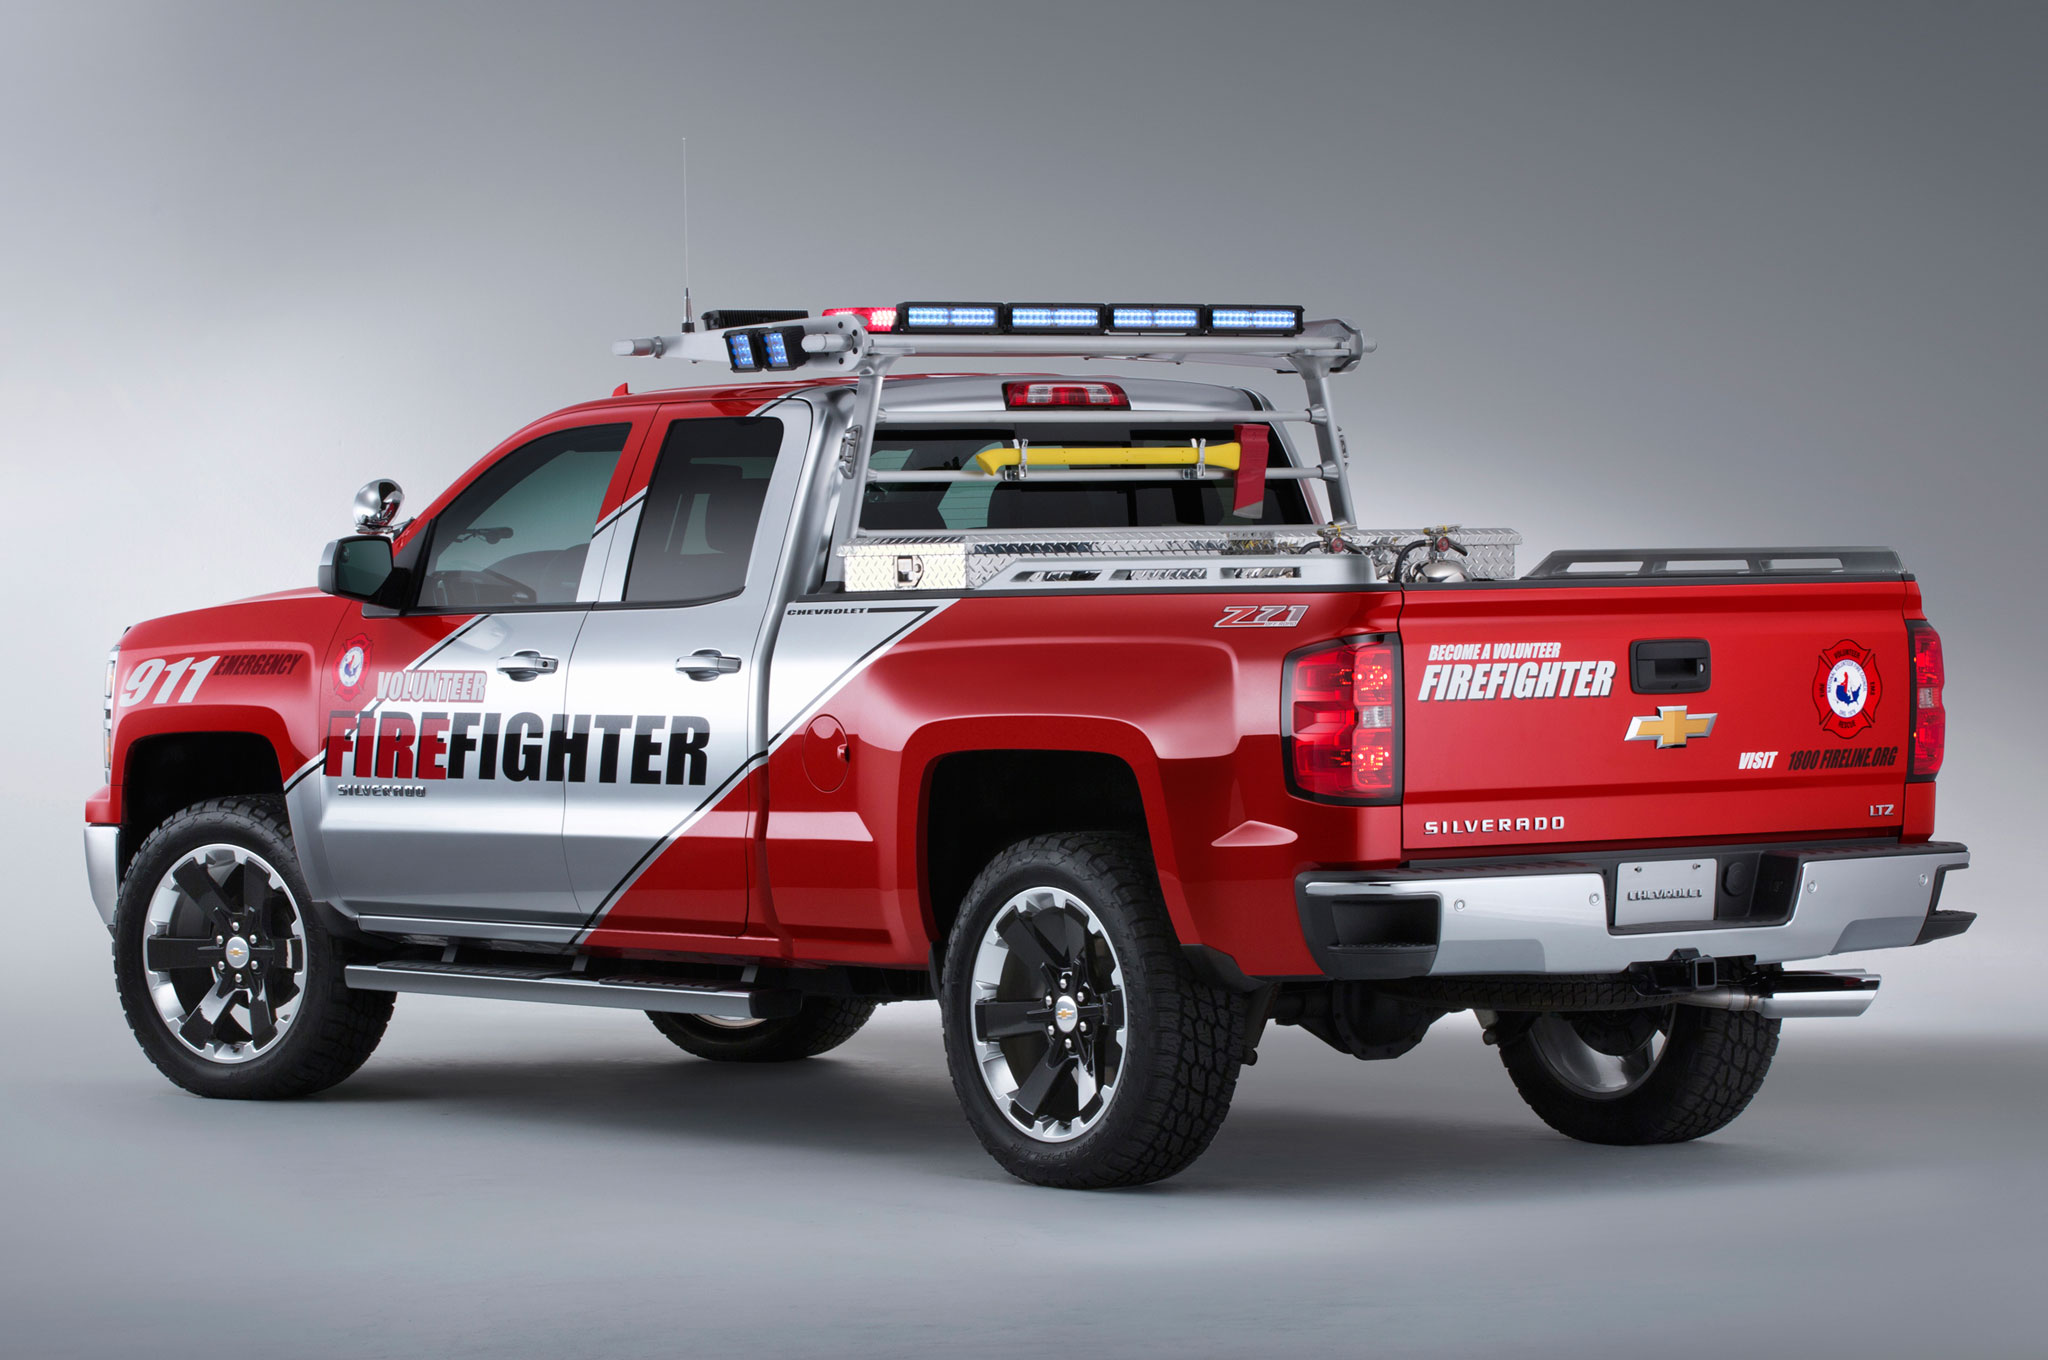 Chevrolet Silverado Volunteer Firefighter, Black Ops Concepts Shown